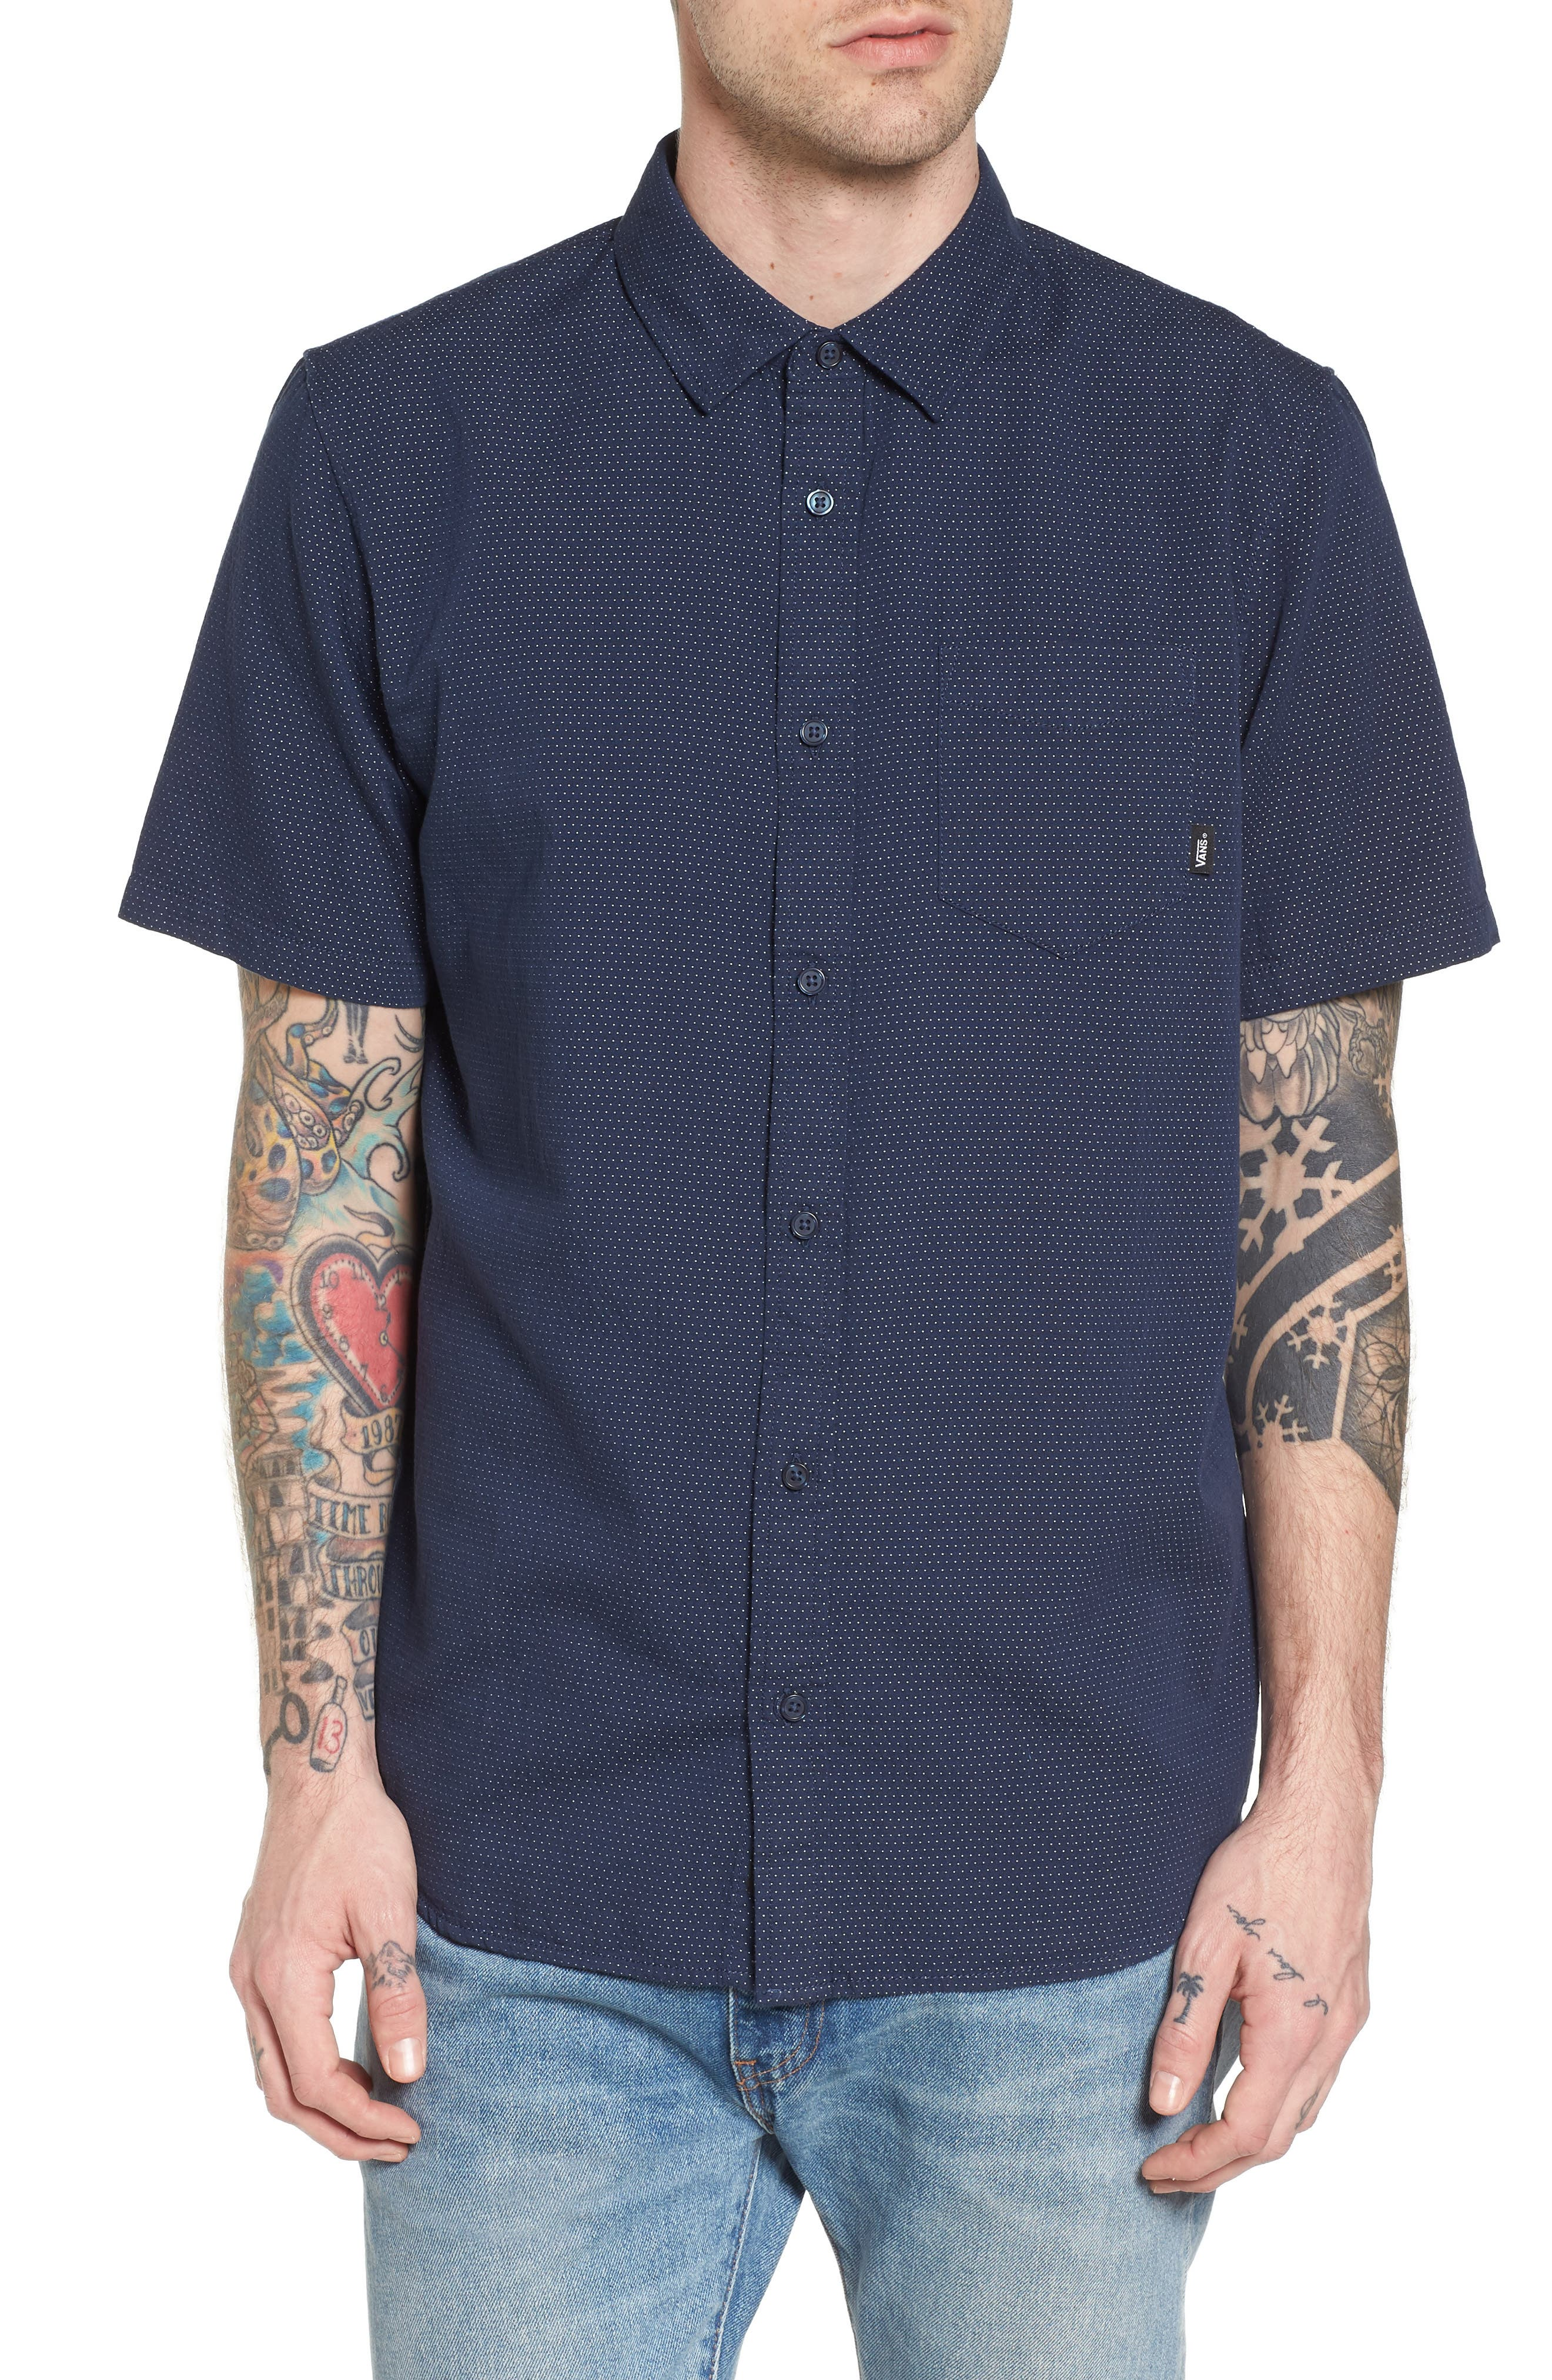 Giddings Short Sleeve Shirt,                         Main,                         color, Dress Blues